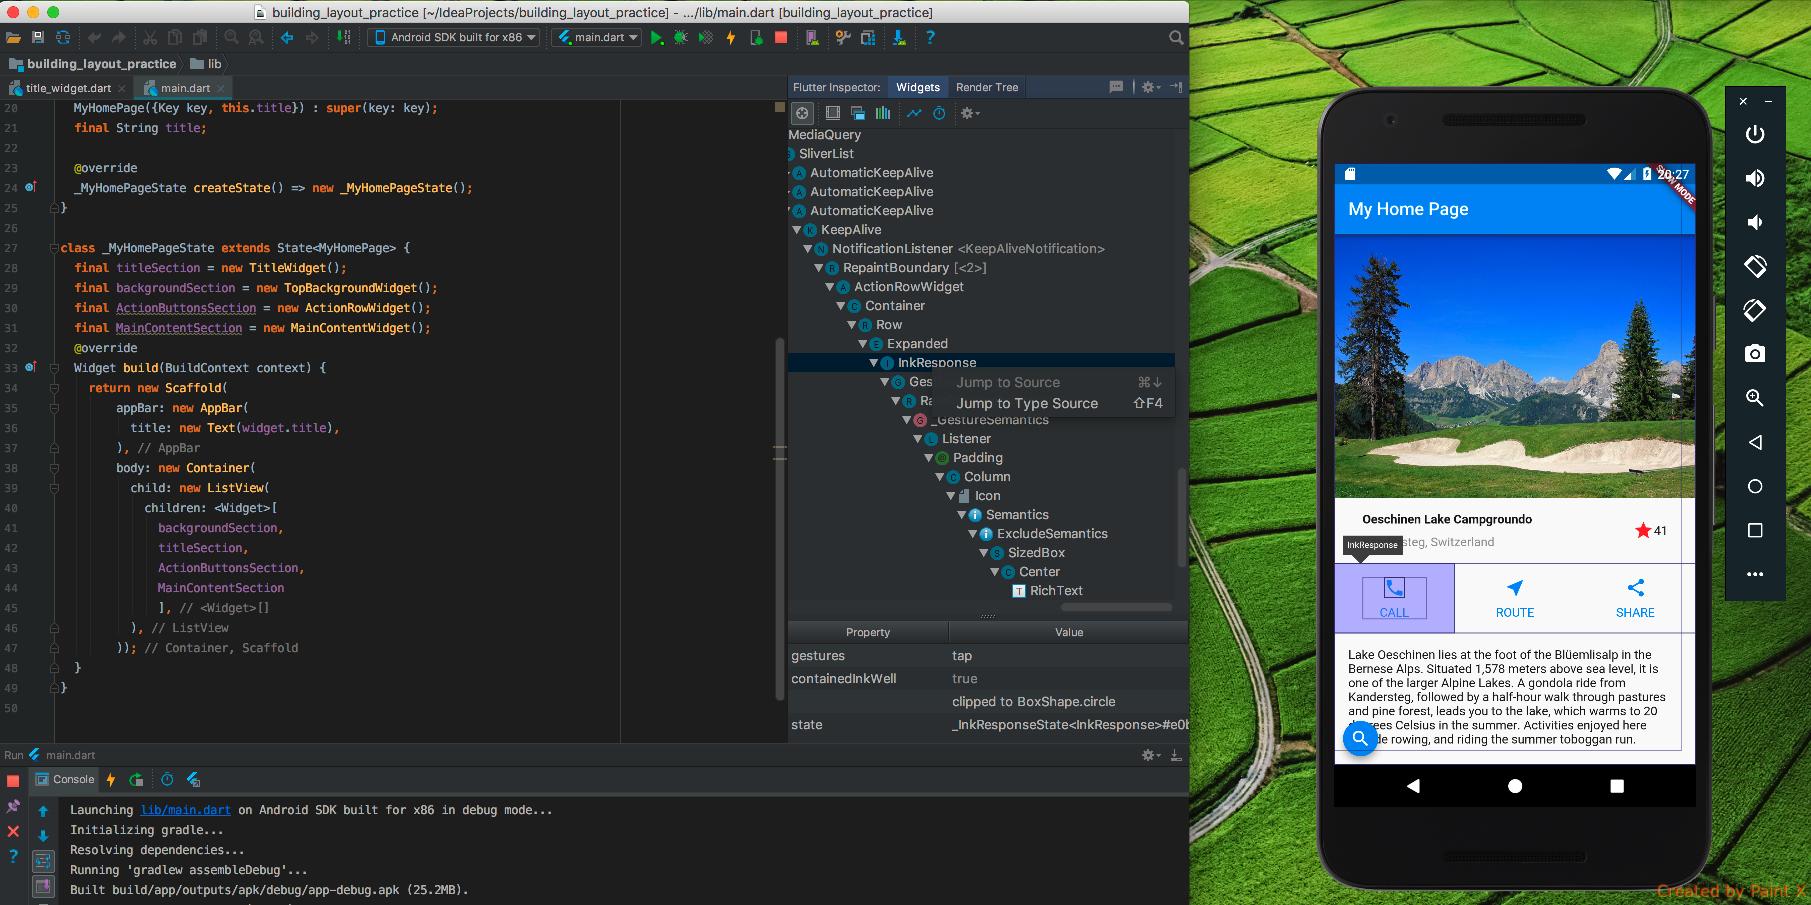 inspect element android studio emulator